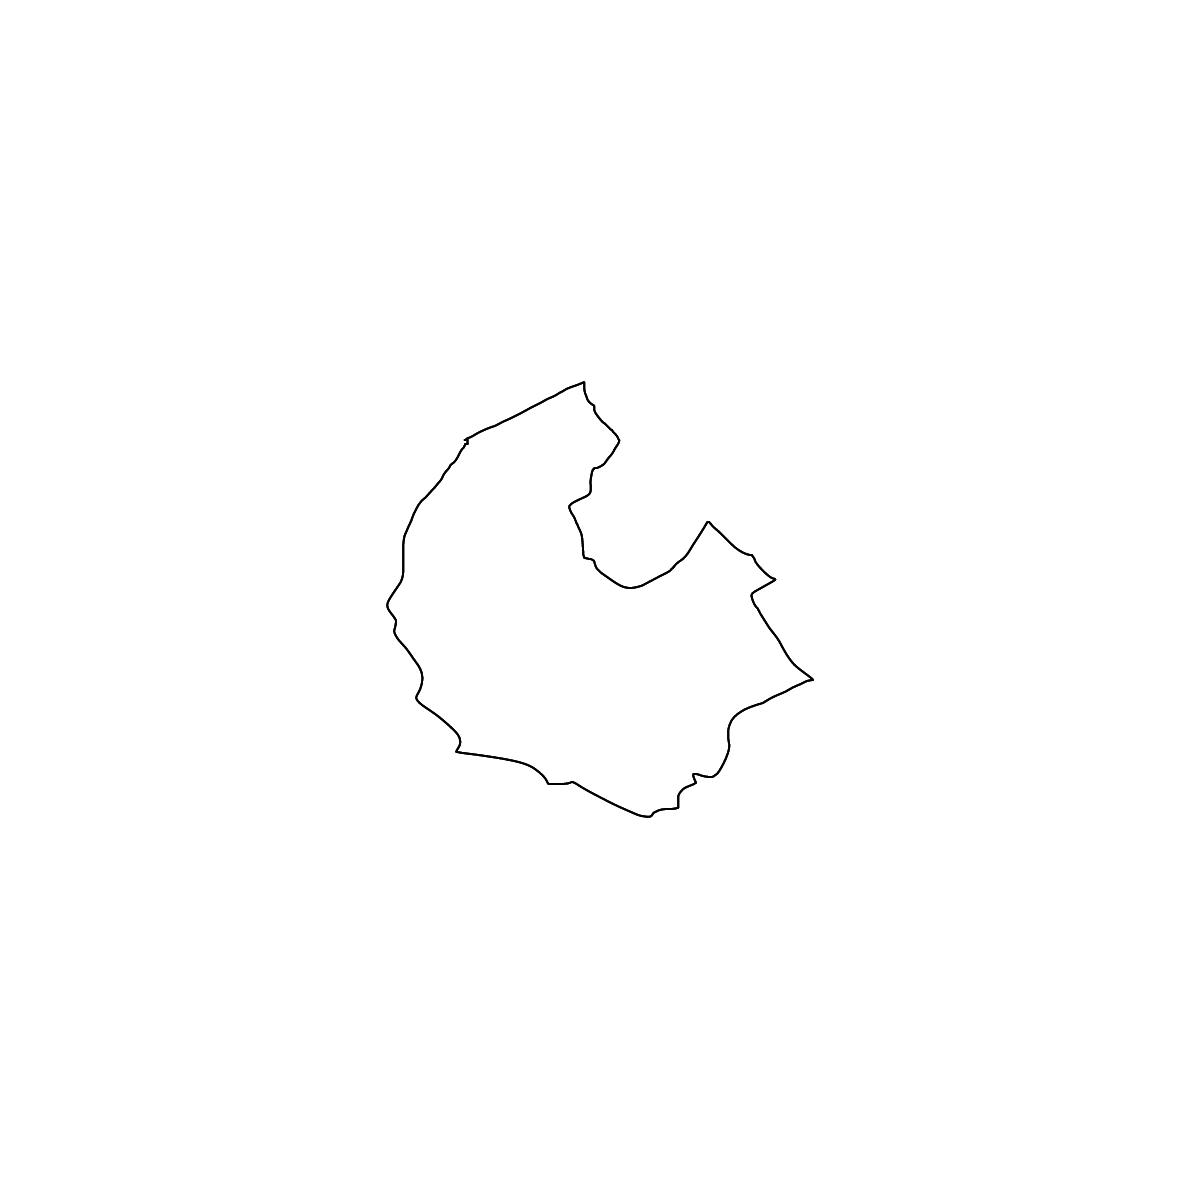 BAAAM drawing#5221 lat:52.2412490844726560lng: 13.5955228805542000